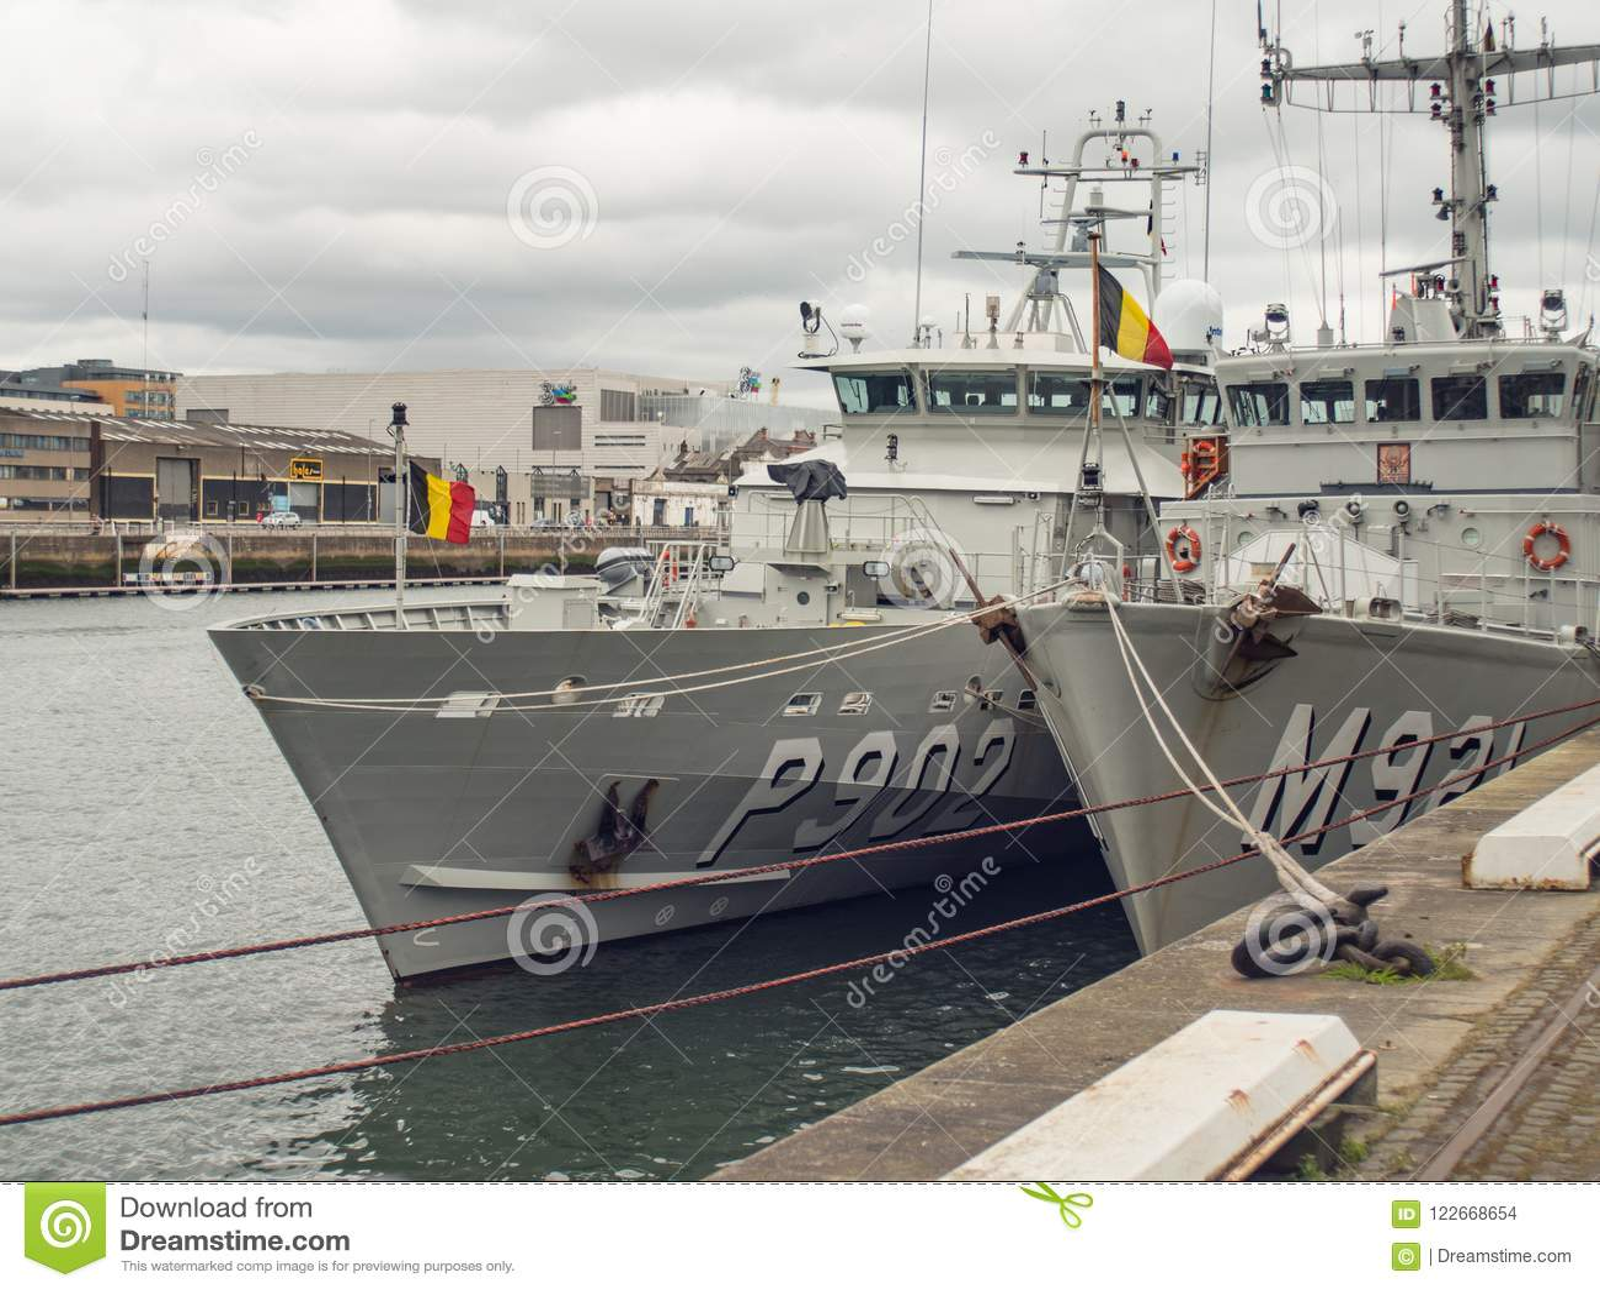 Belgische Marinemilitärschiffe legten auf Fluss Liffey, Dublin, Irland an